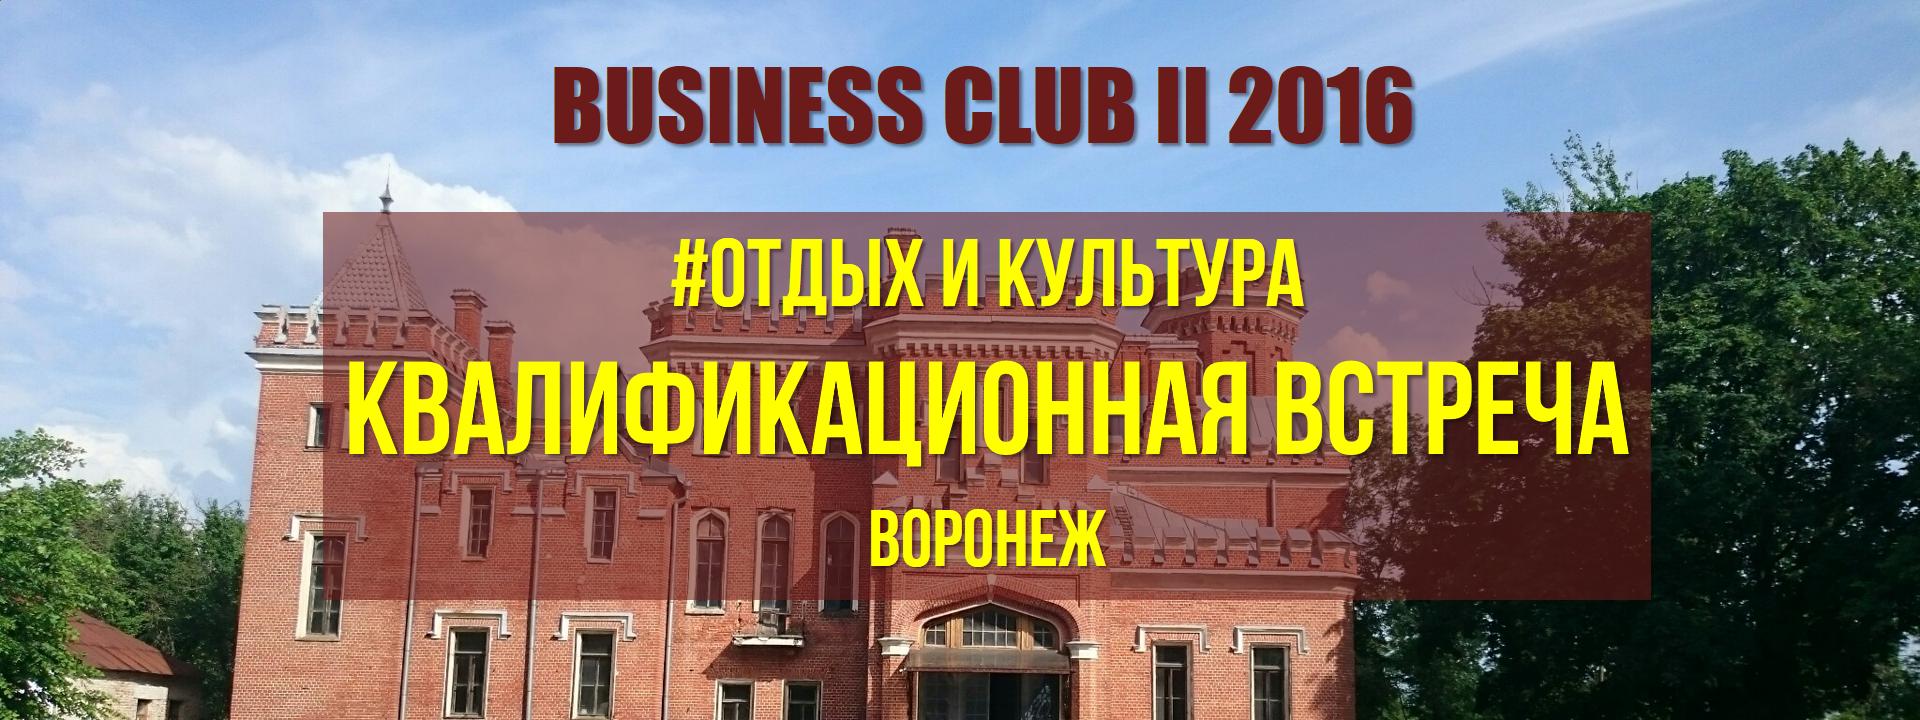 Бизнес-клуб-2-Воронеж